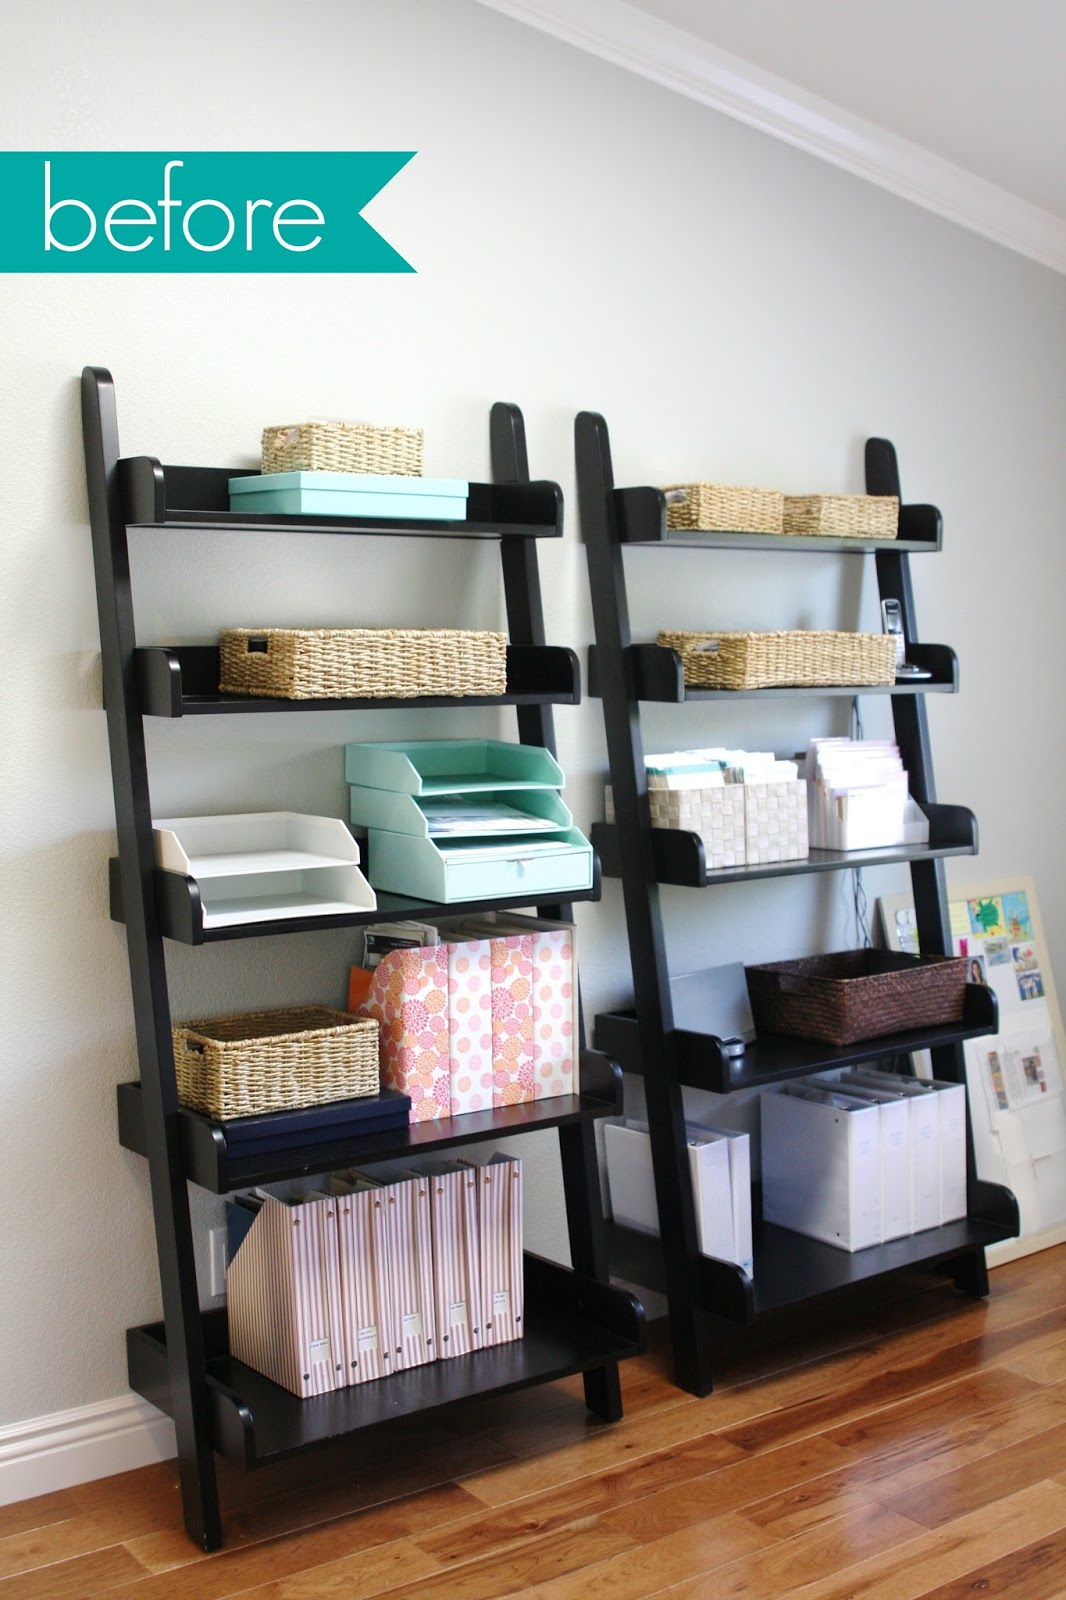 Diy Office Organization 1 Diy Home Office DIY Office Organization U2013 With Martha Stewart Diy 1 Home A